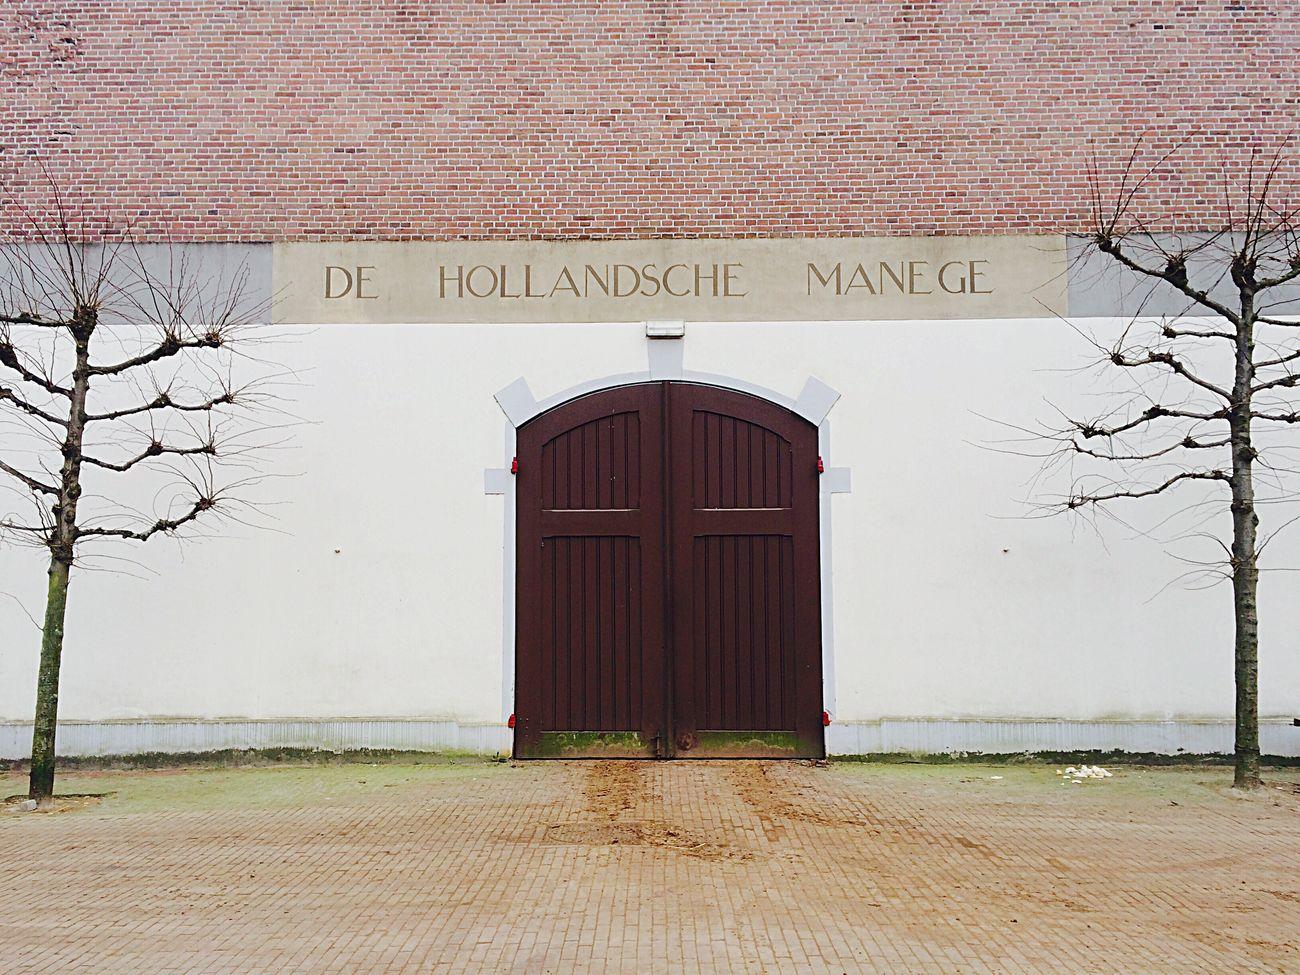 De Hollandsche Manege Horsehotel Manège  Overtoomse Veld Horselife